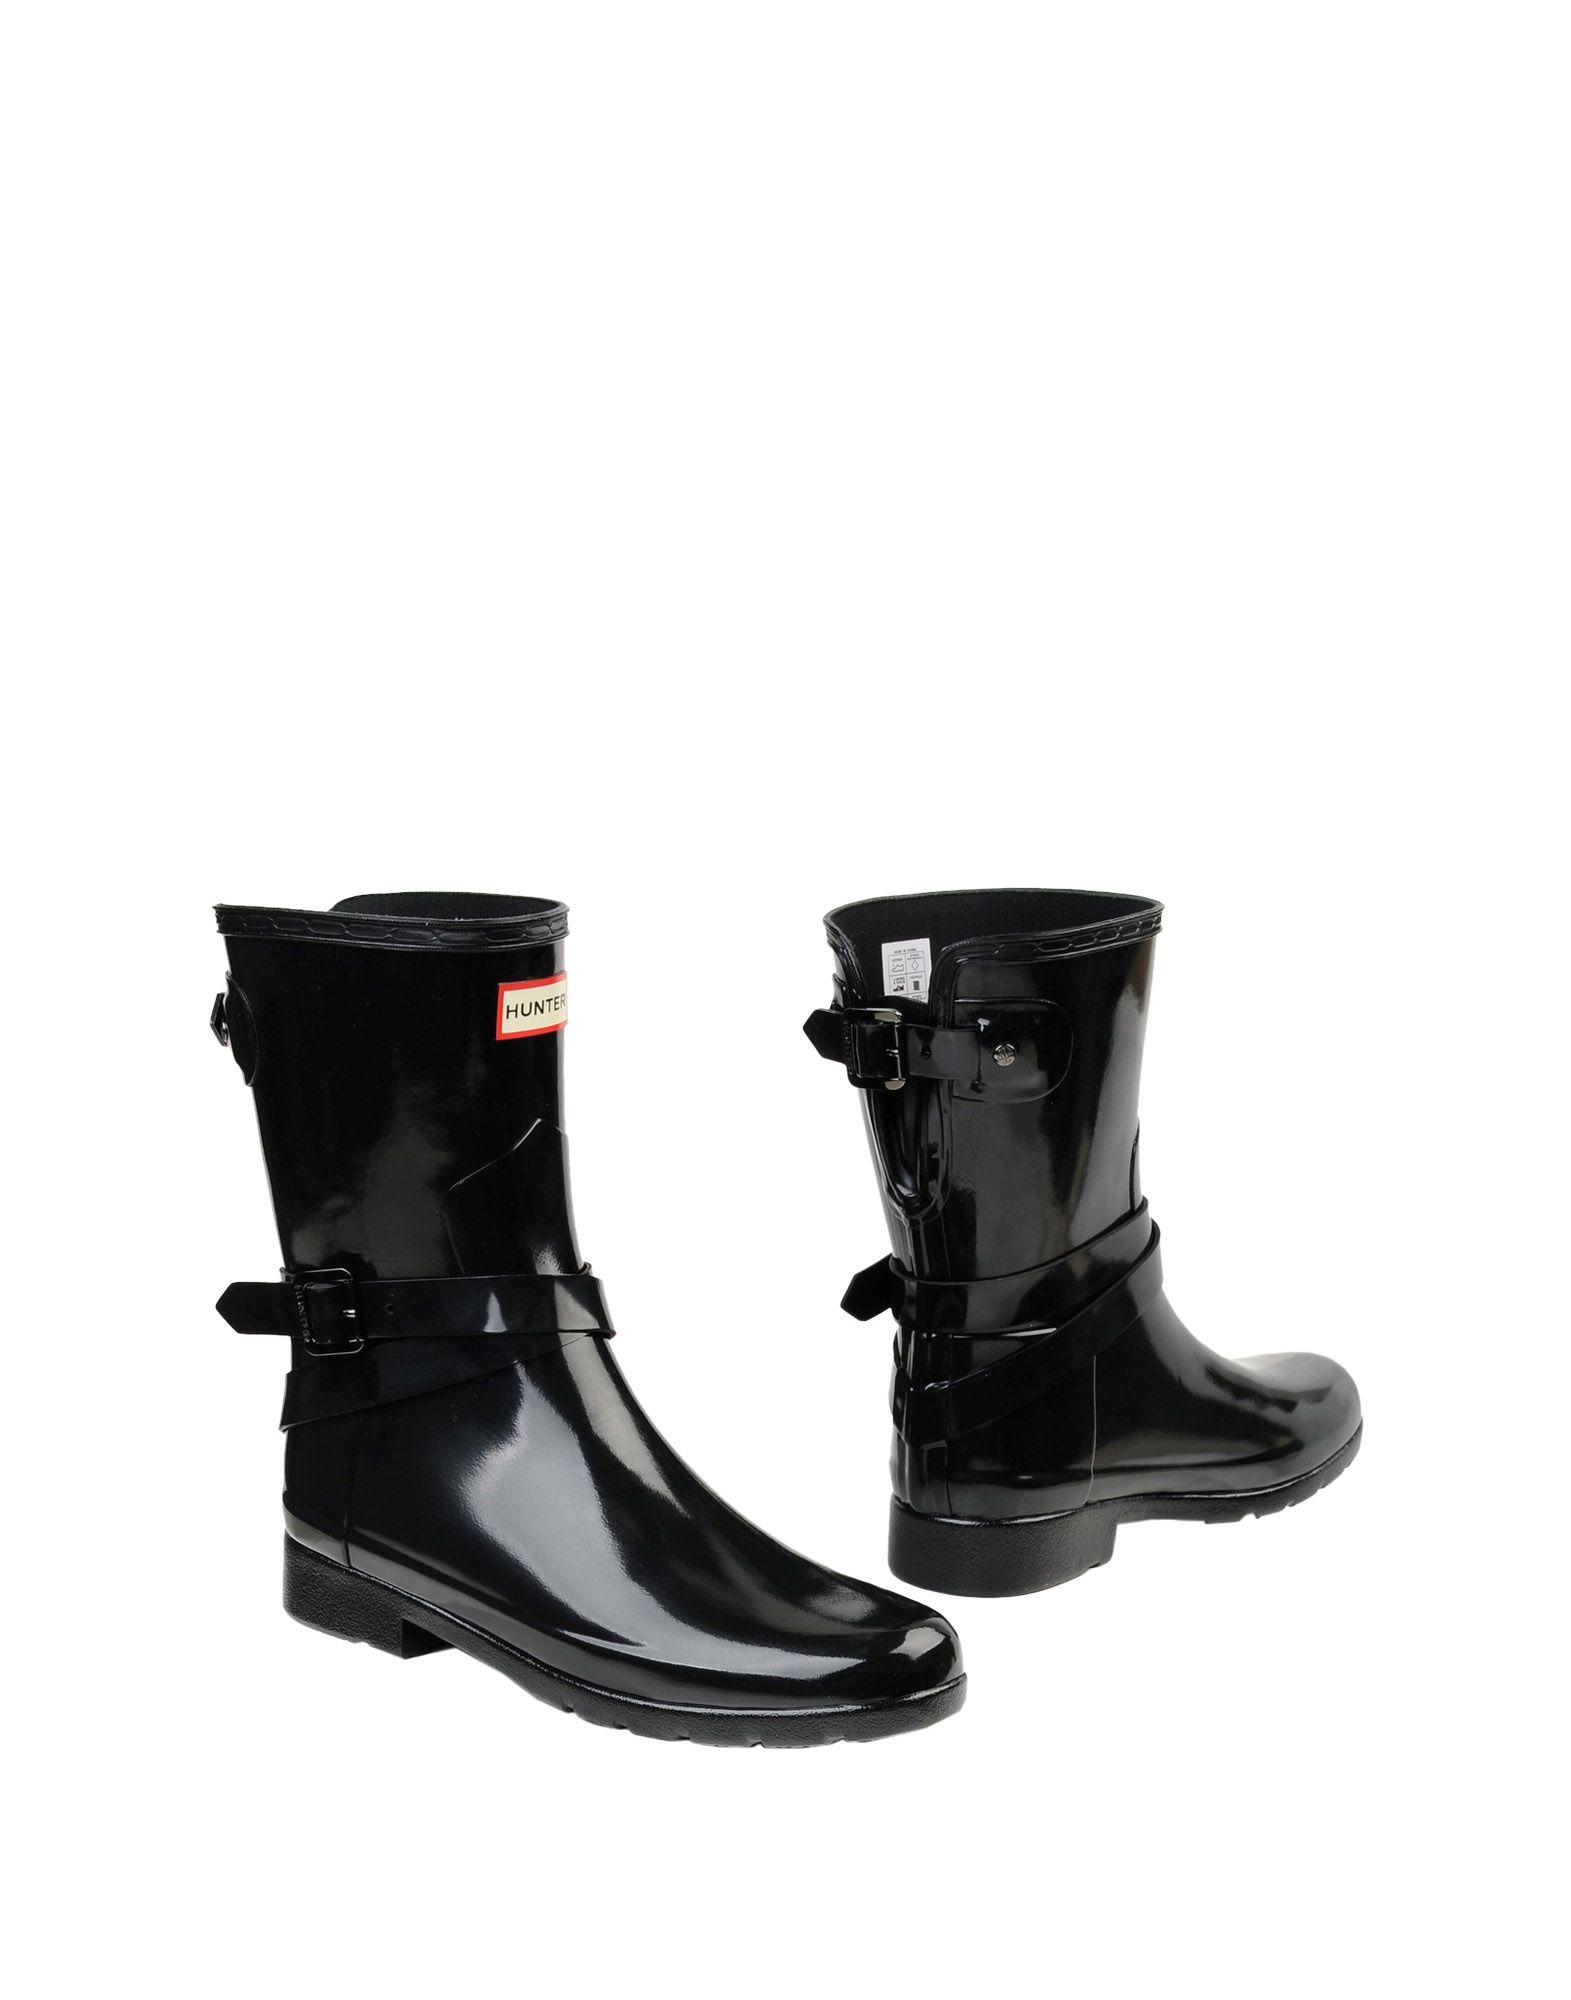 Stivaletti Hunter Refined Back Adjustable Short W/ Ankle Strap Gloss - Donna - Acquista online su